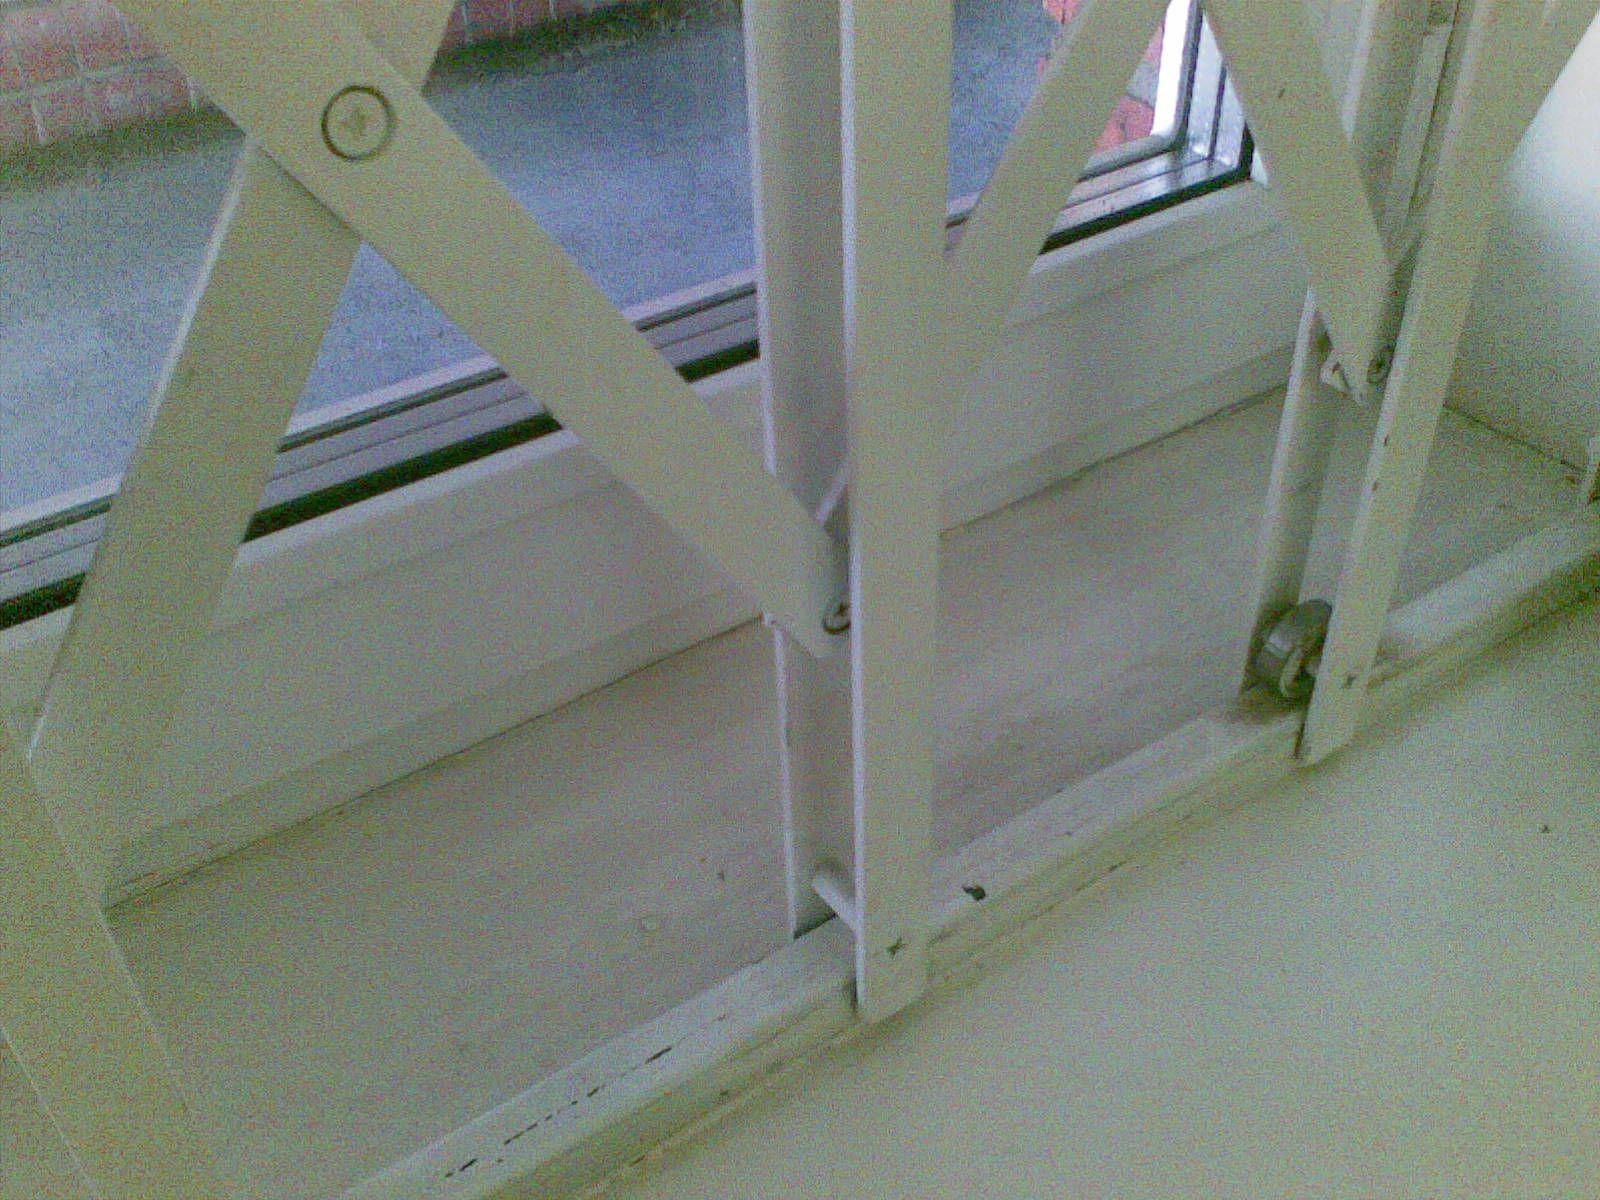 Menuiserie meubles services fenetre aluminium Algerie